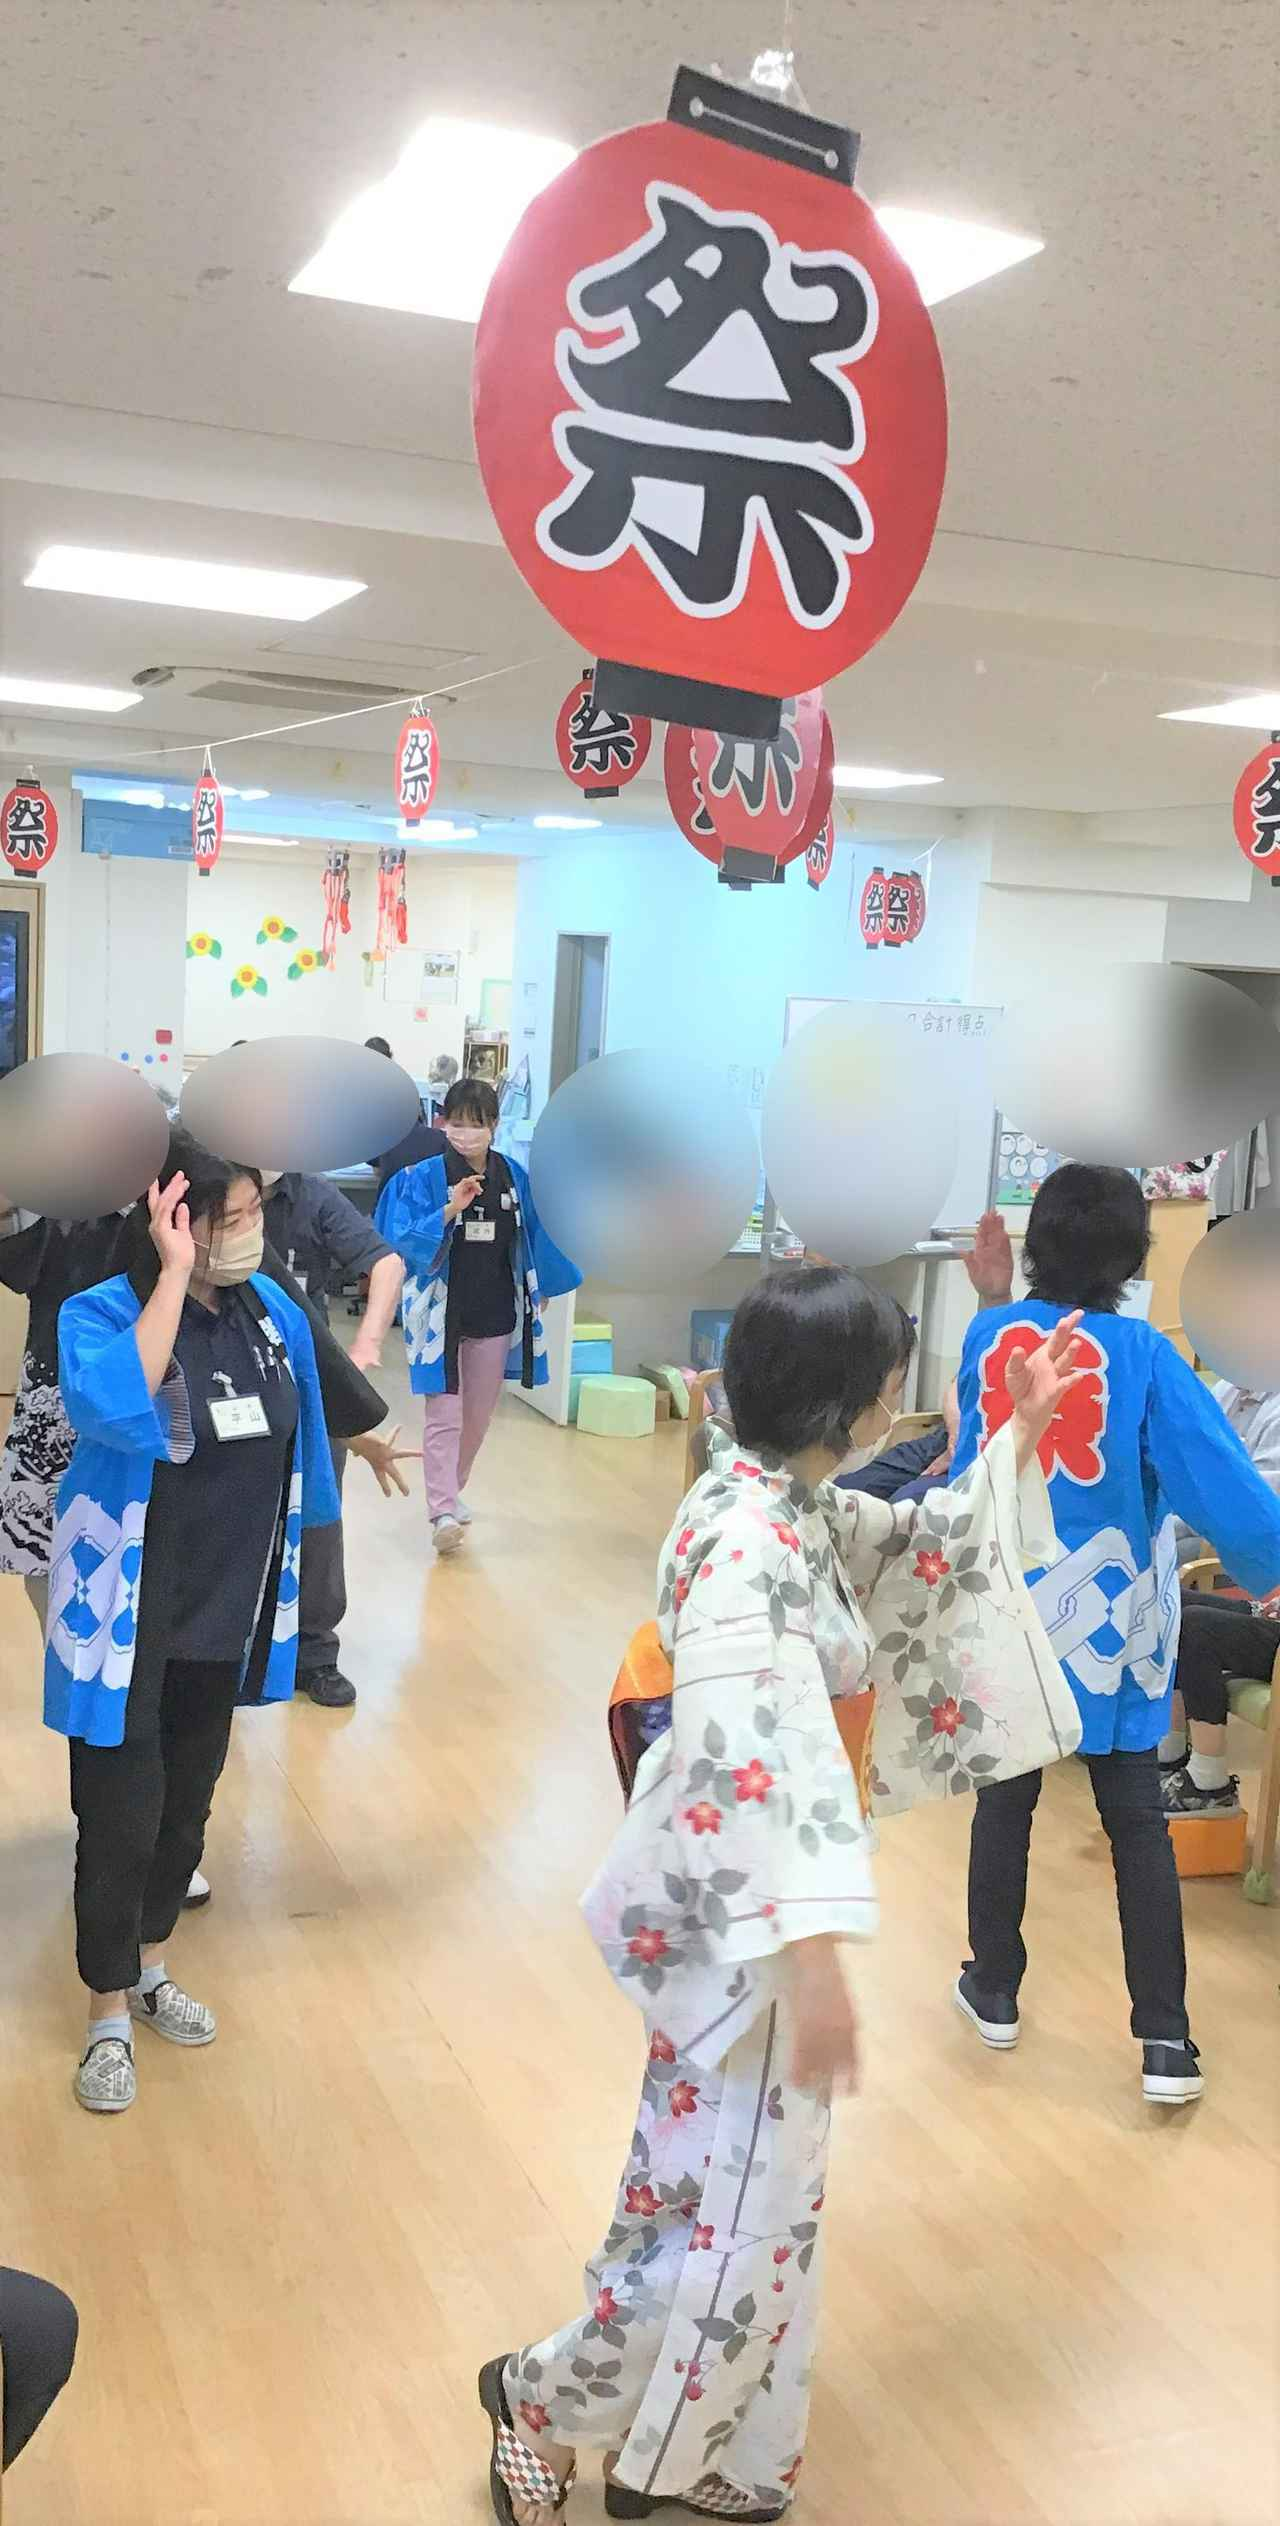 画像2: 夏祭り(小平)2日目